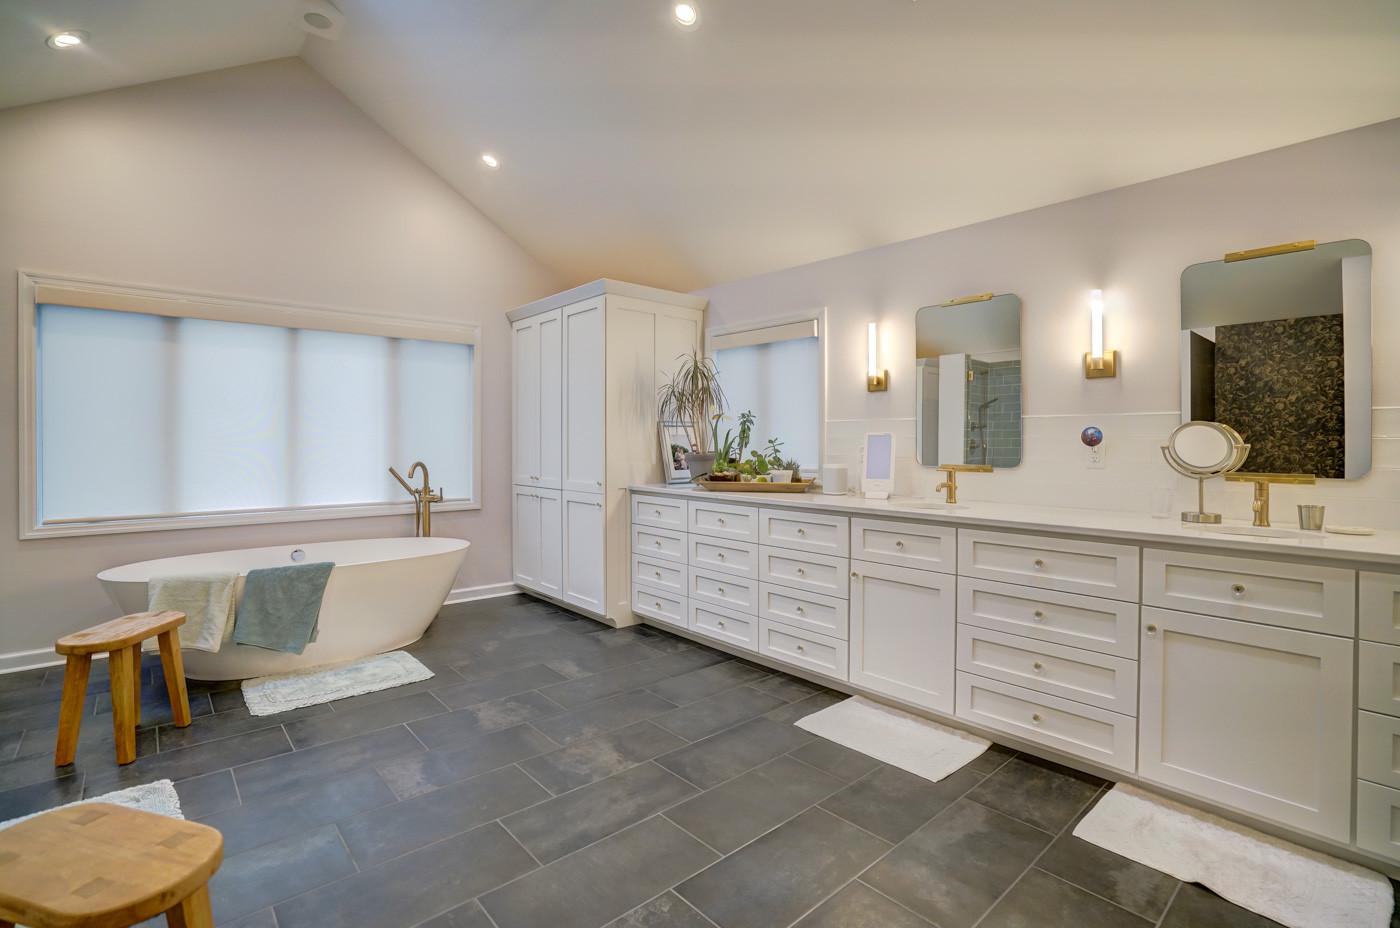 Nakoma Bathroom Remdel